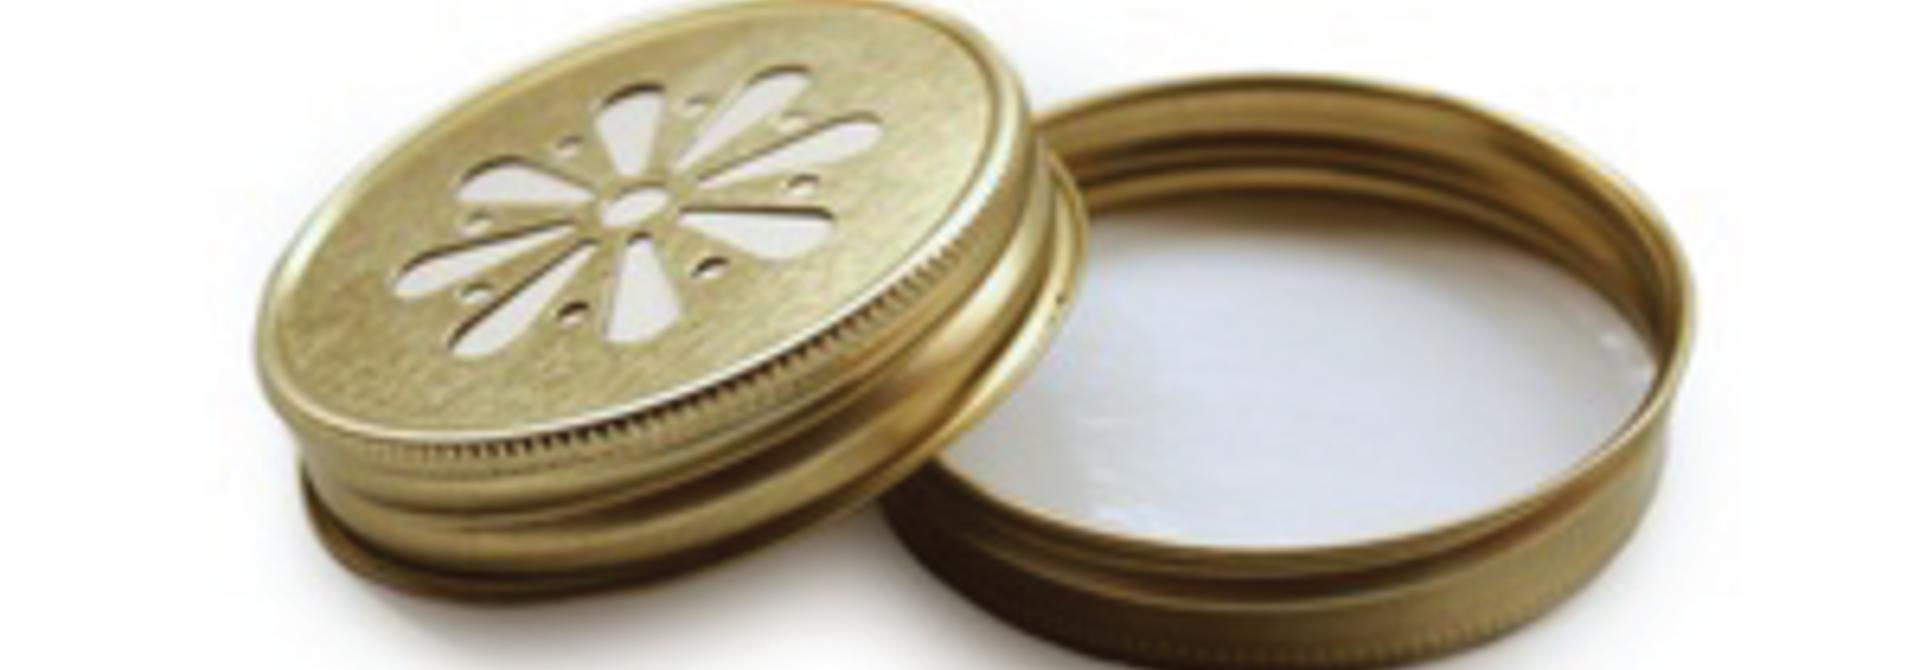 Mason Jar margriet deksel goud